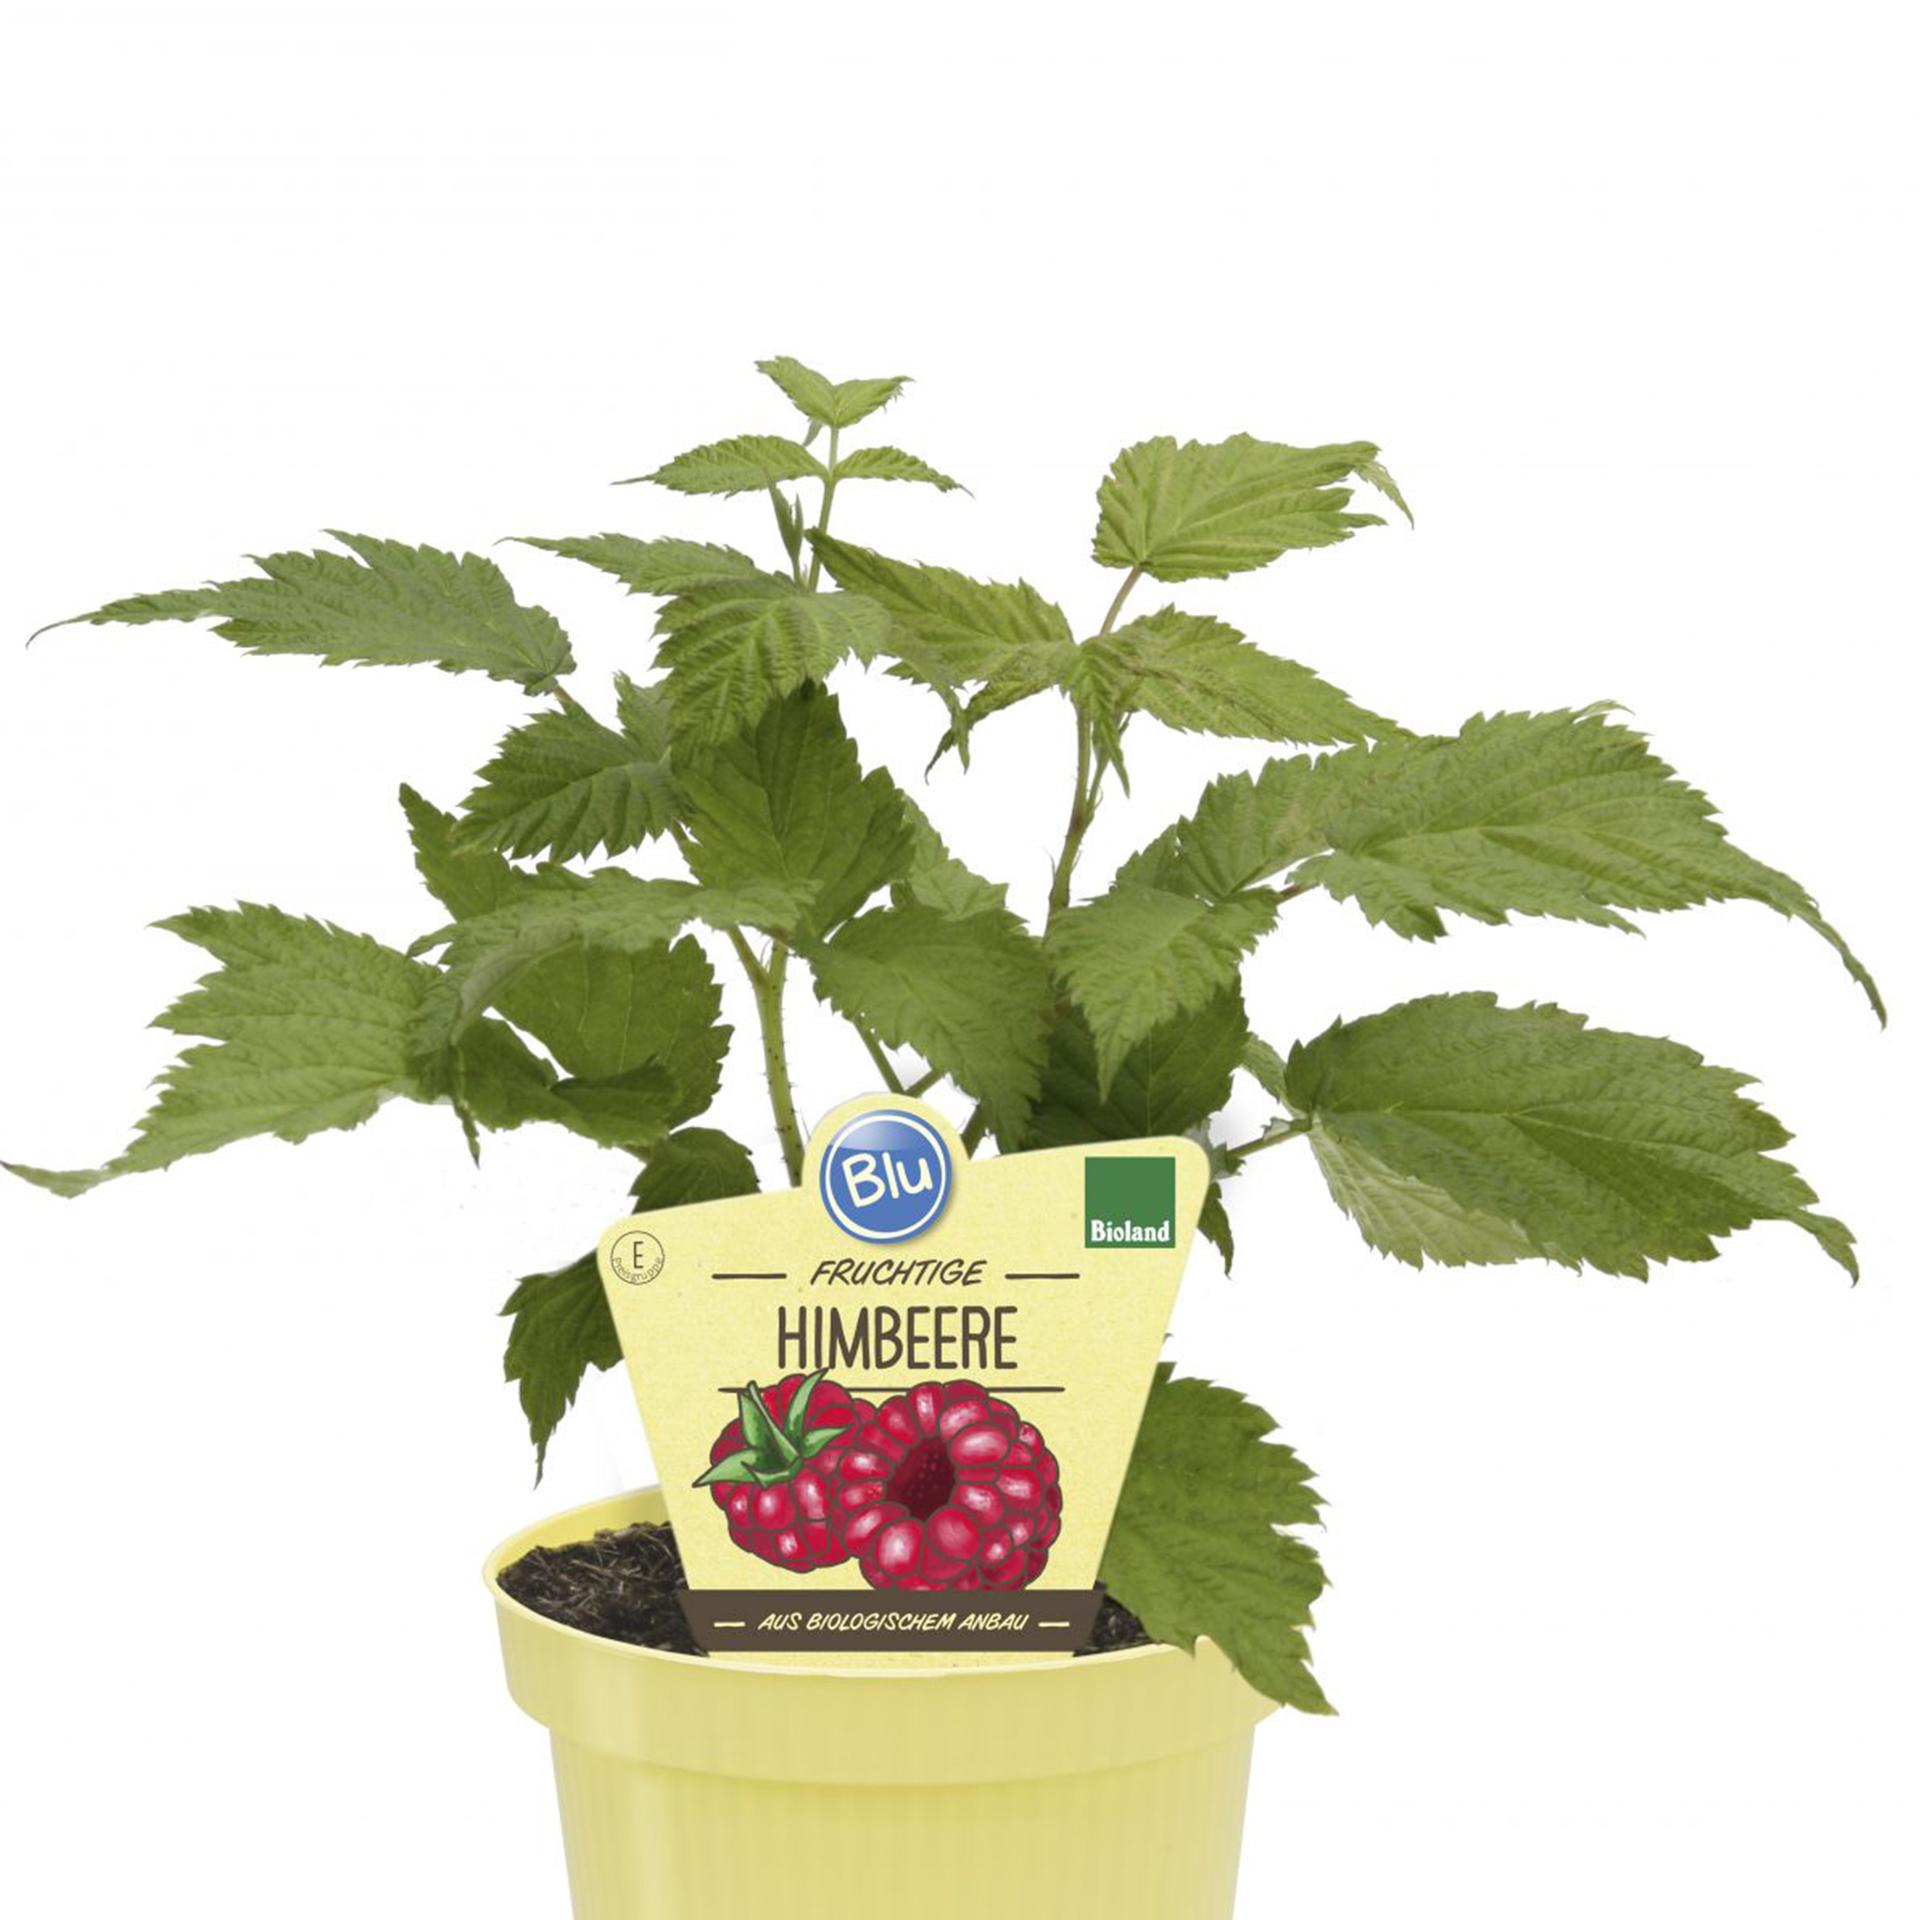 BIO Himbeere - Rubus Idaeus 'Little Sweet Sister', 12cm Topf